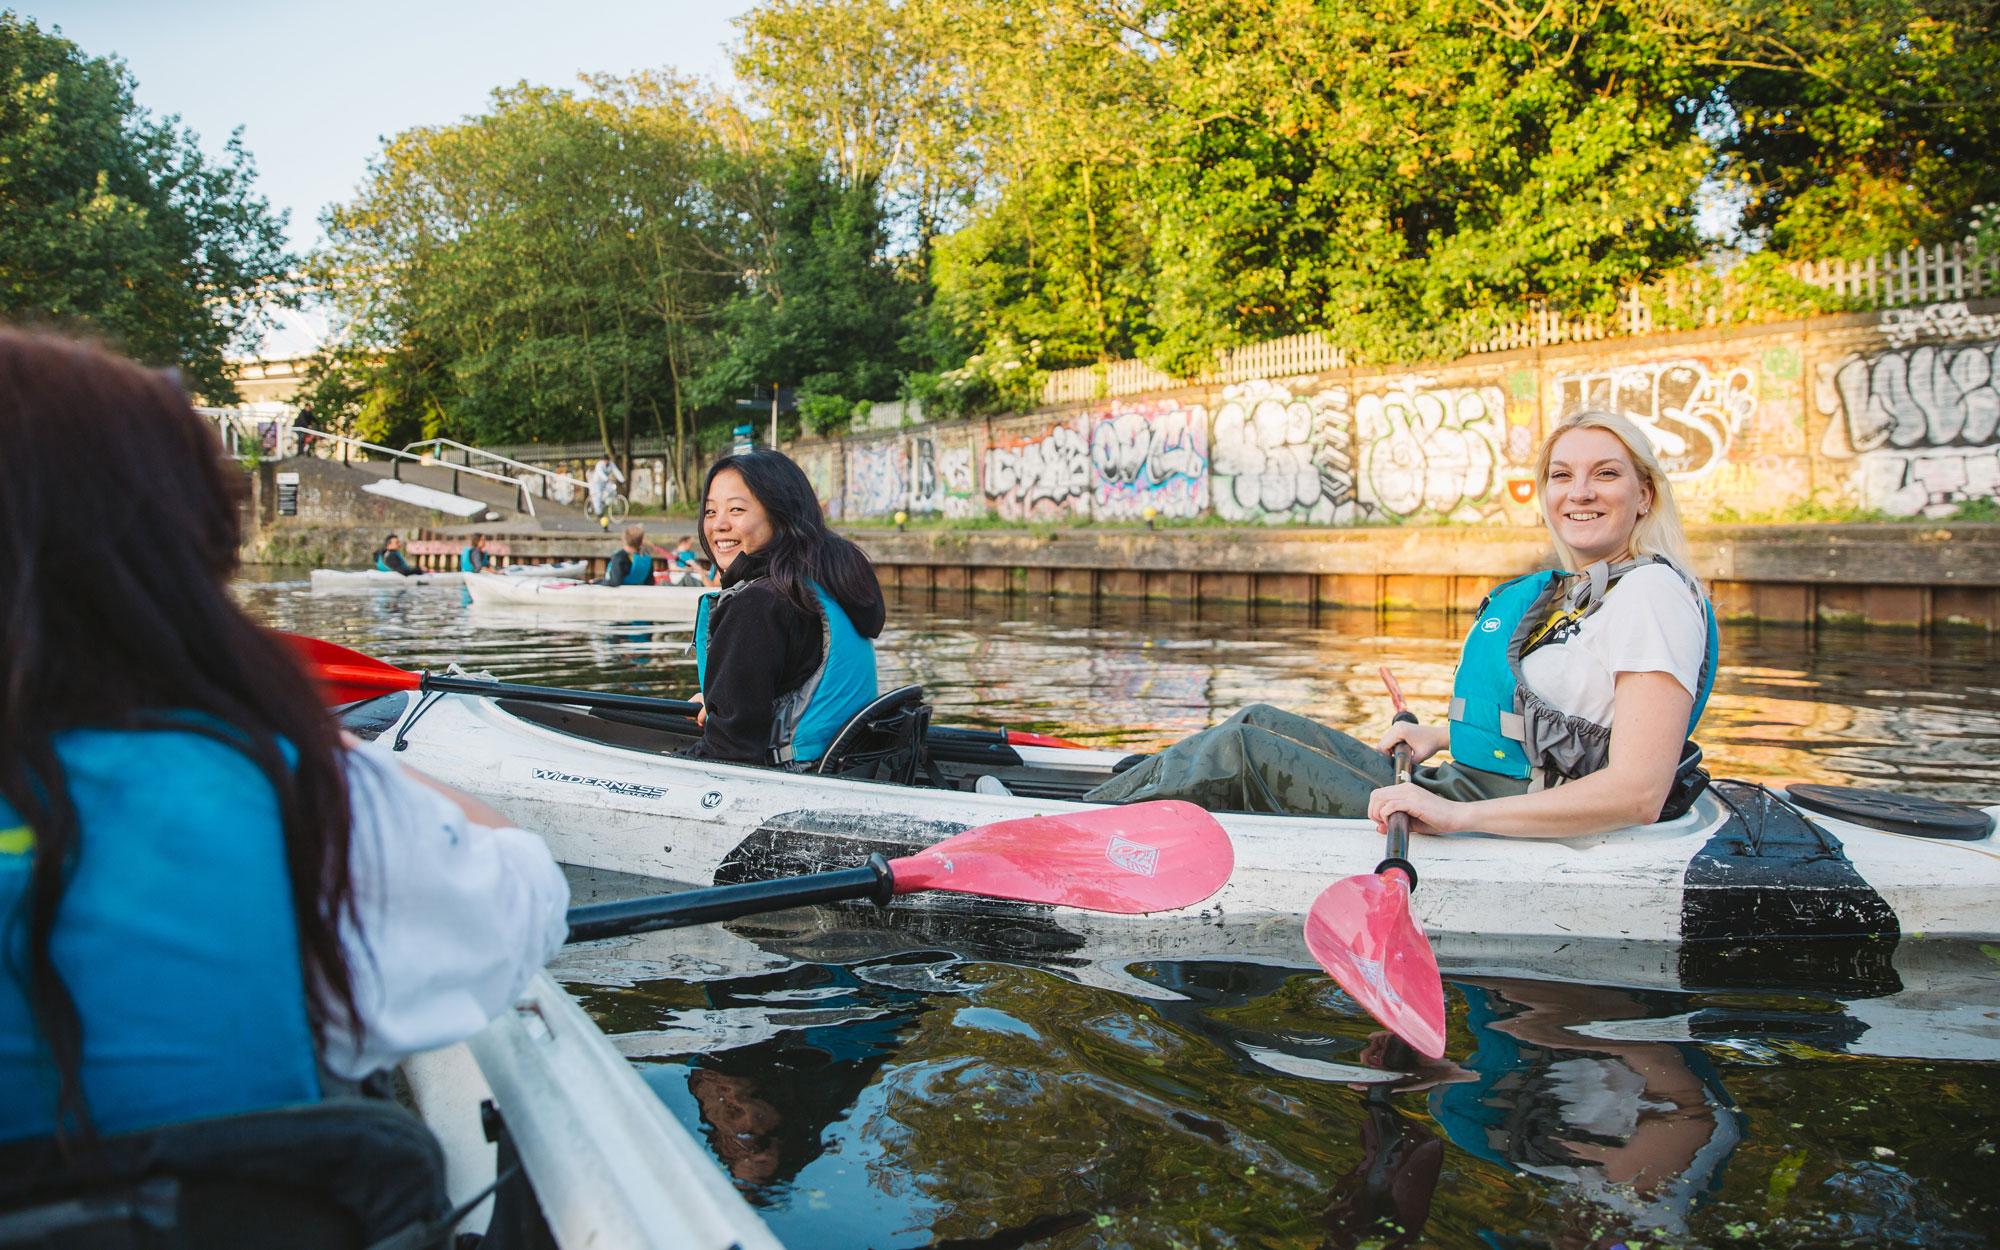 Kayaking secret adventures away day teambuilding